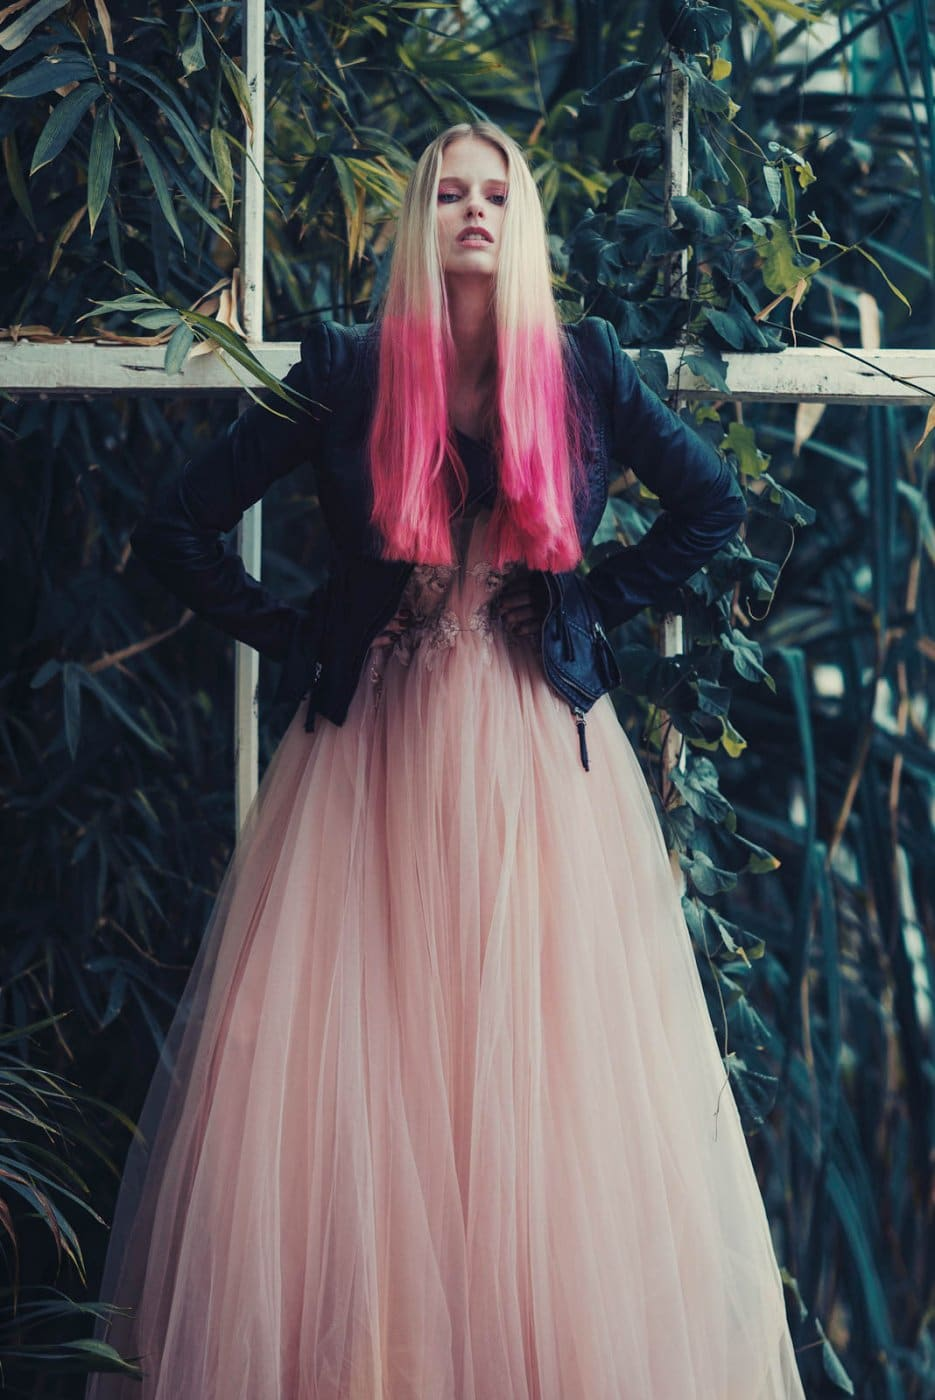 Portrait Photography By Anastasia Vervueren Tropical Goddess Pink Hair